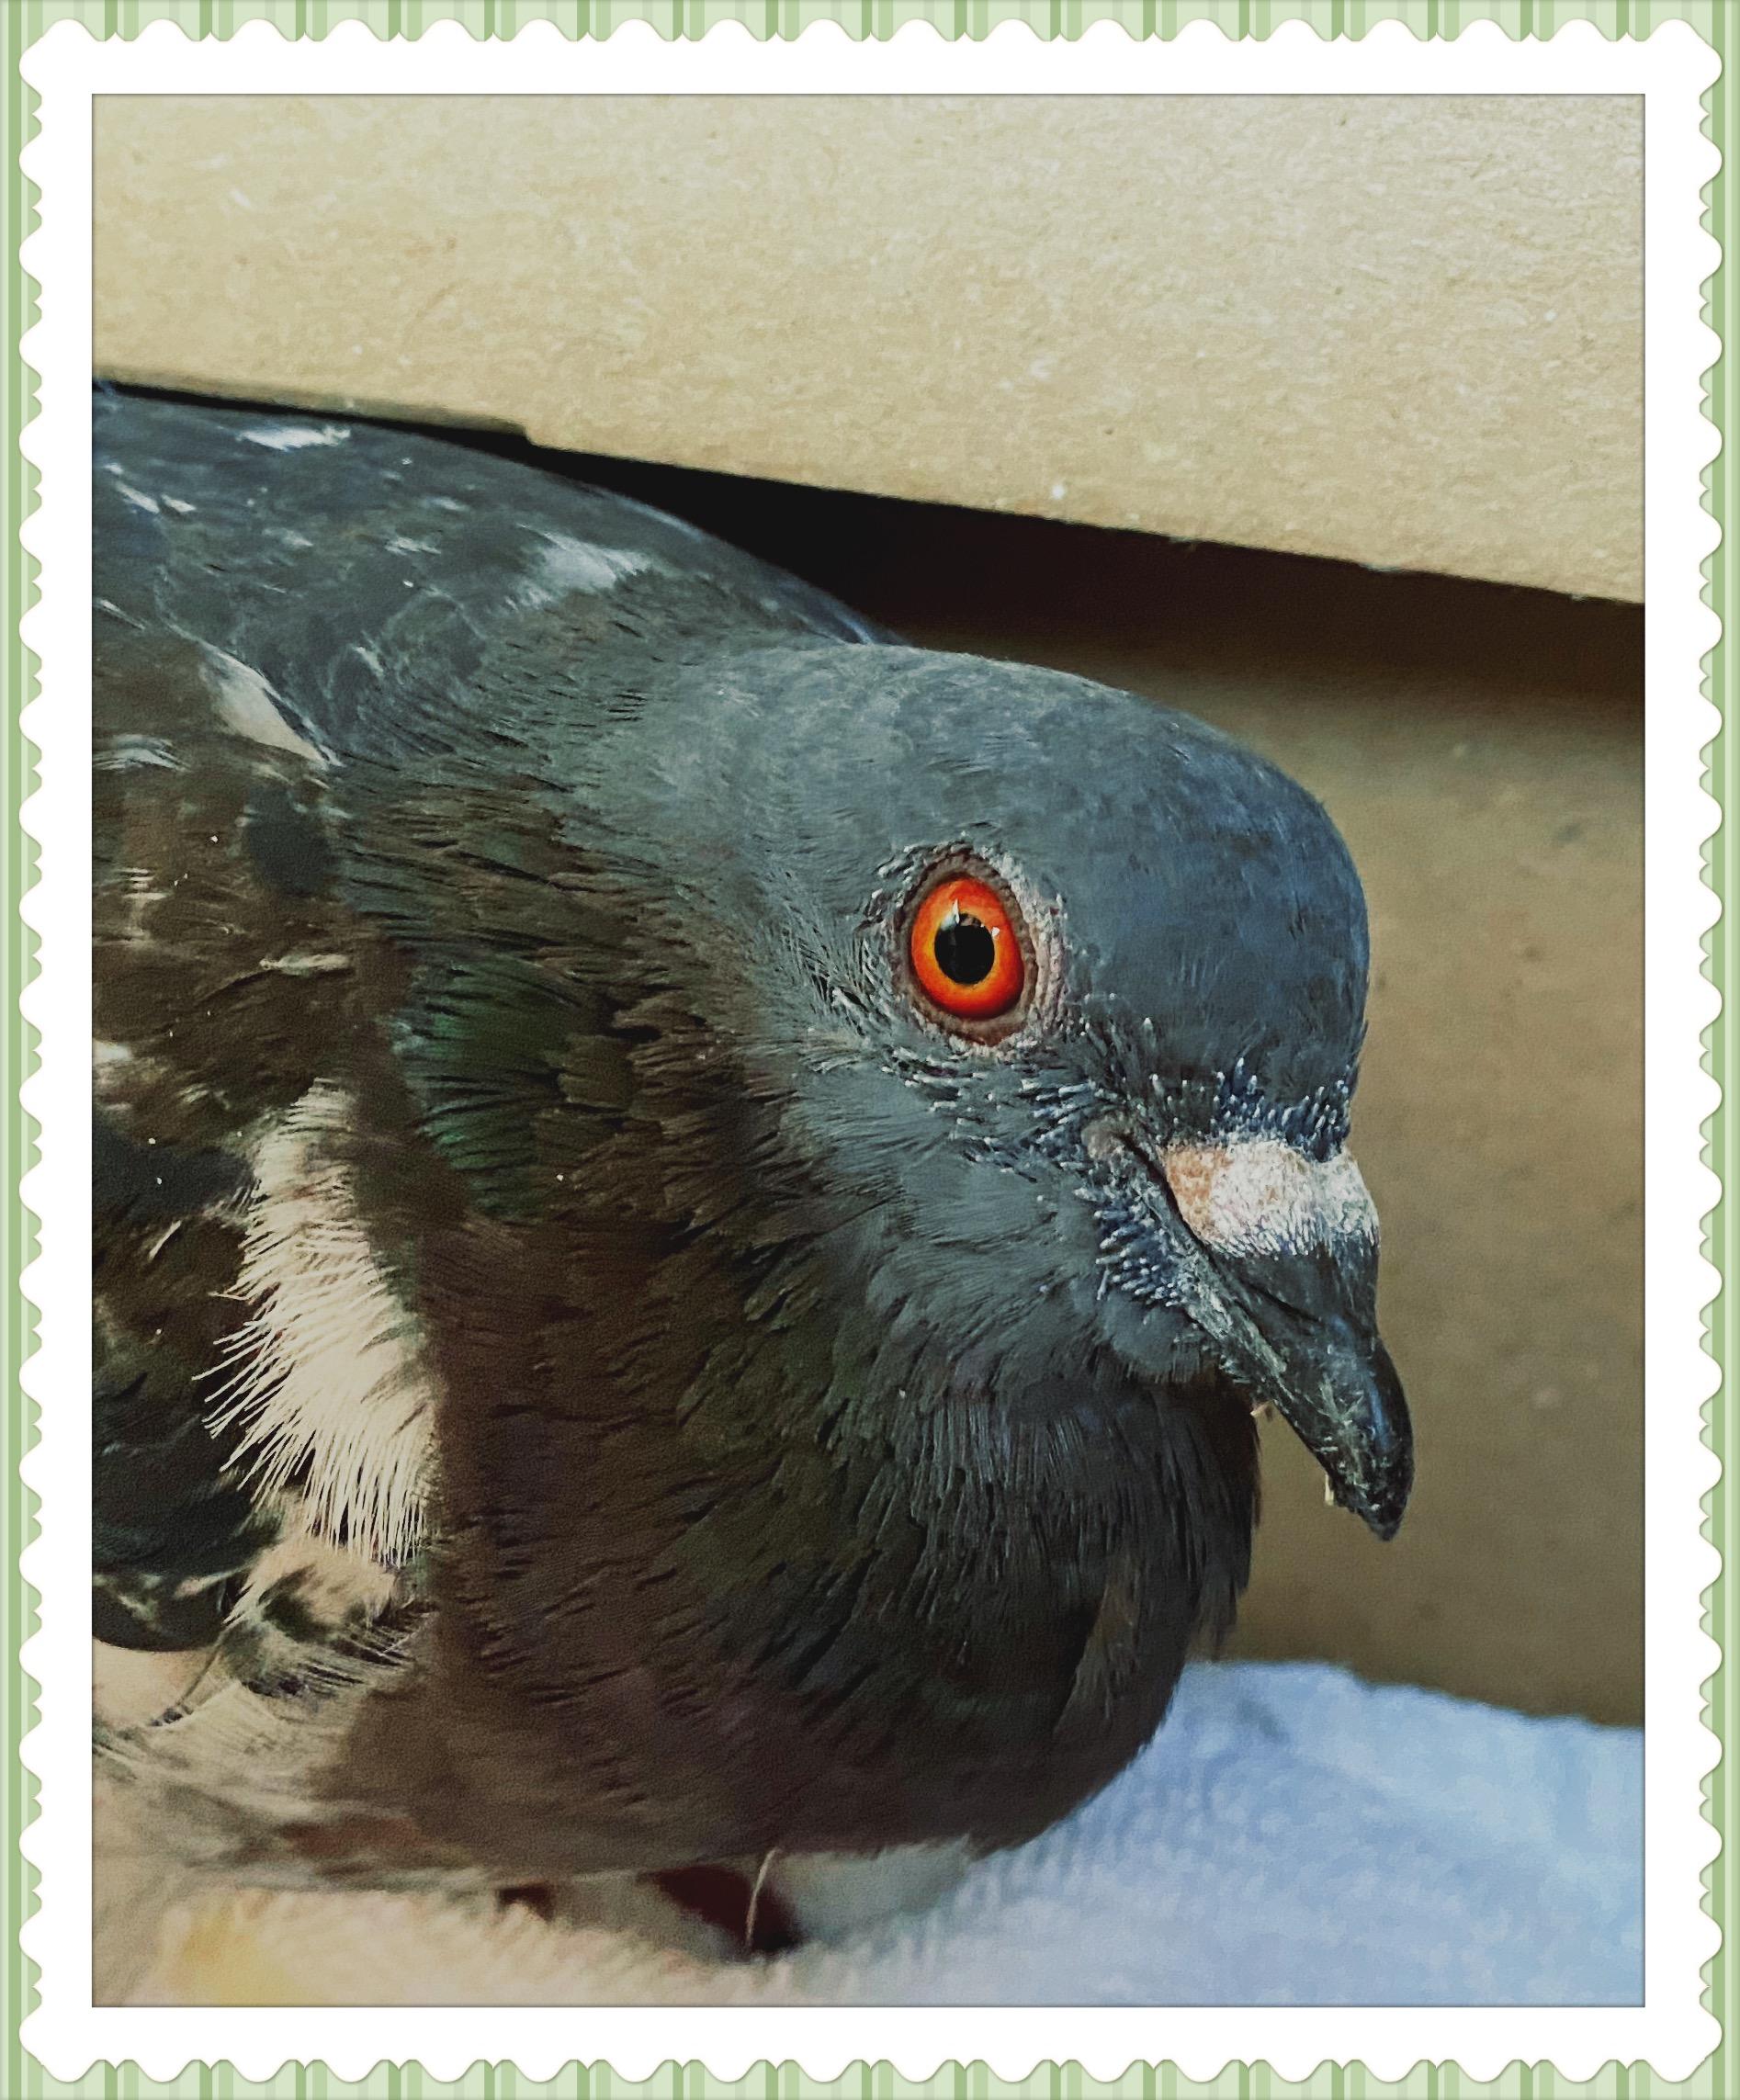 Meet Pidge. Lessons in Animal Communication